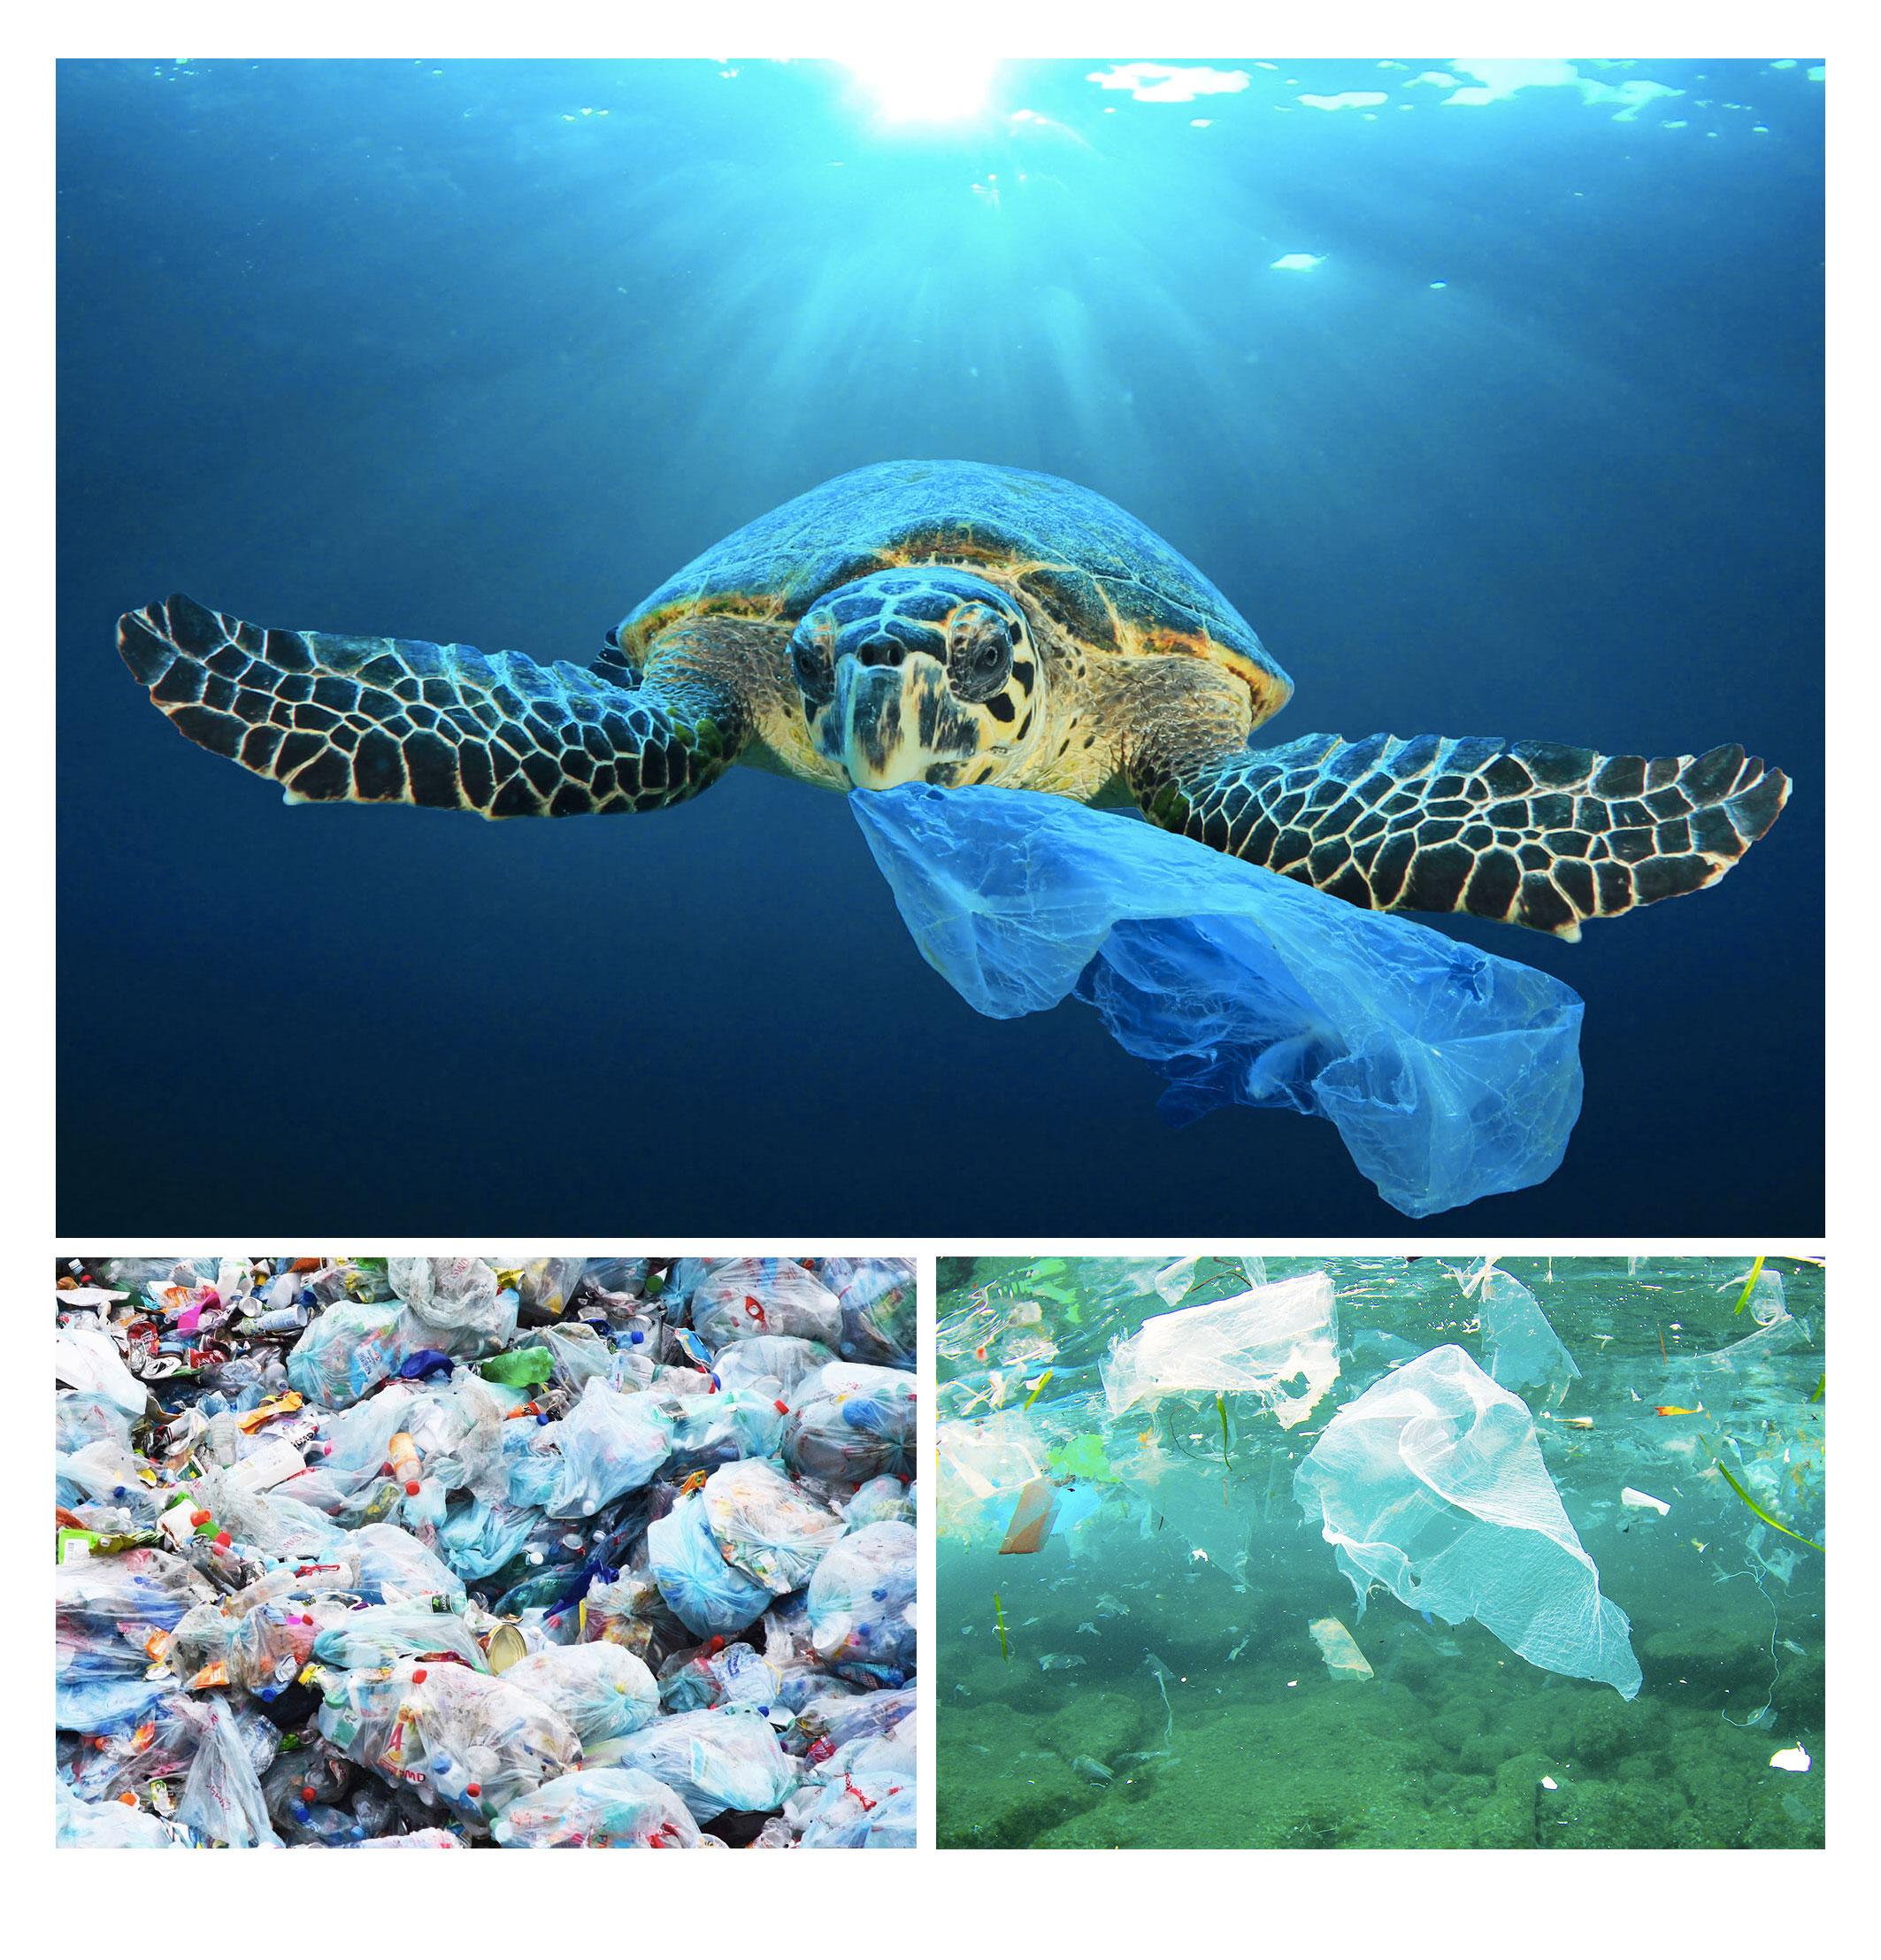 plastic_bag_pollution-3image.jpg